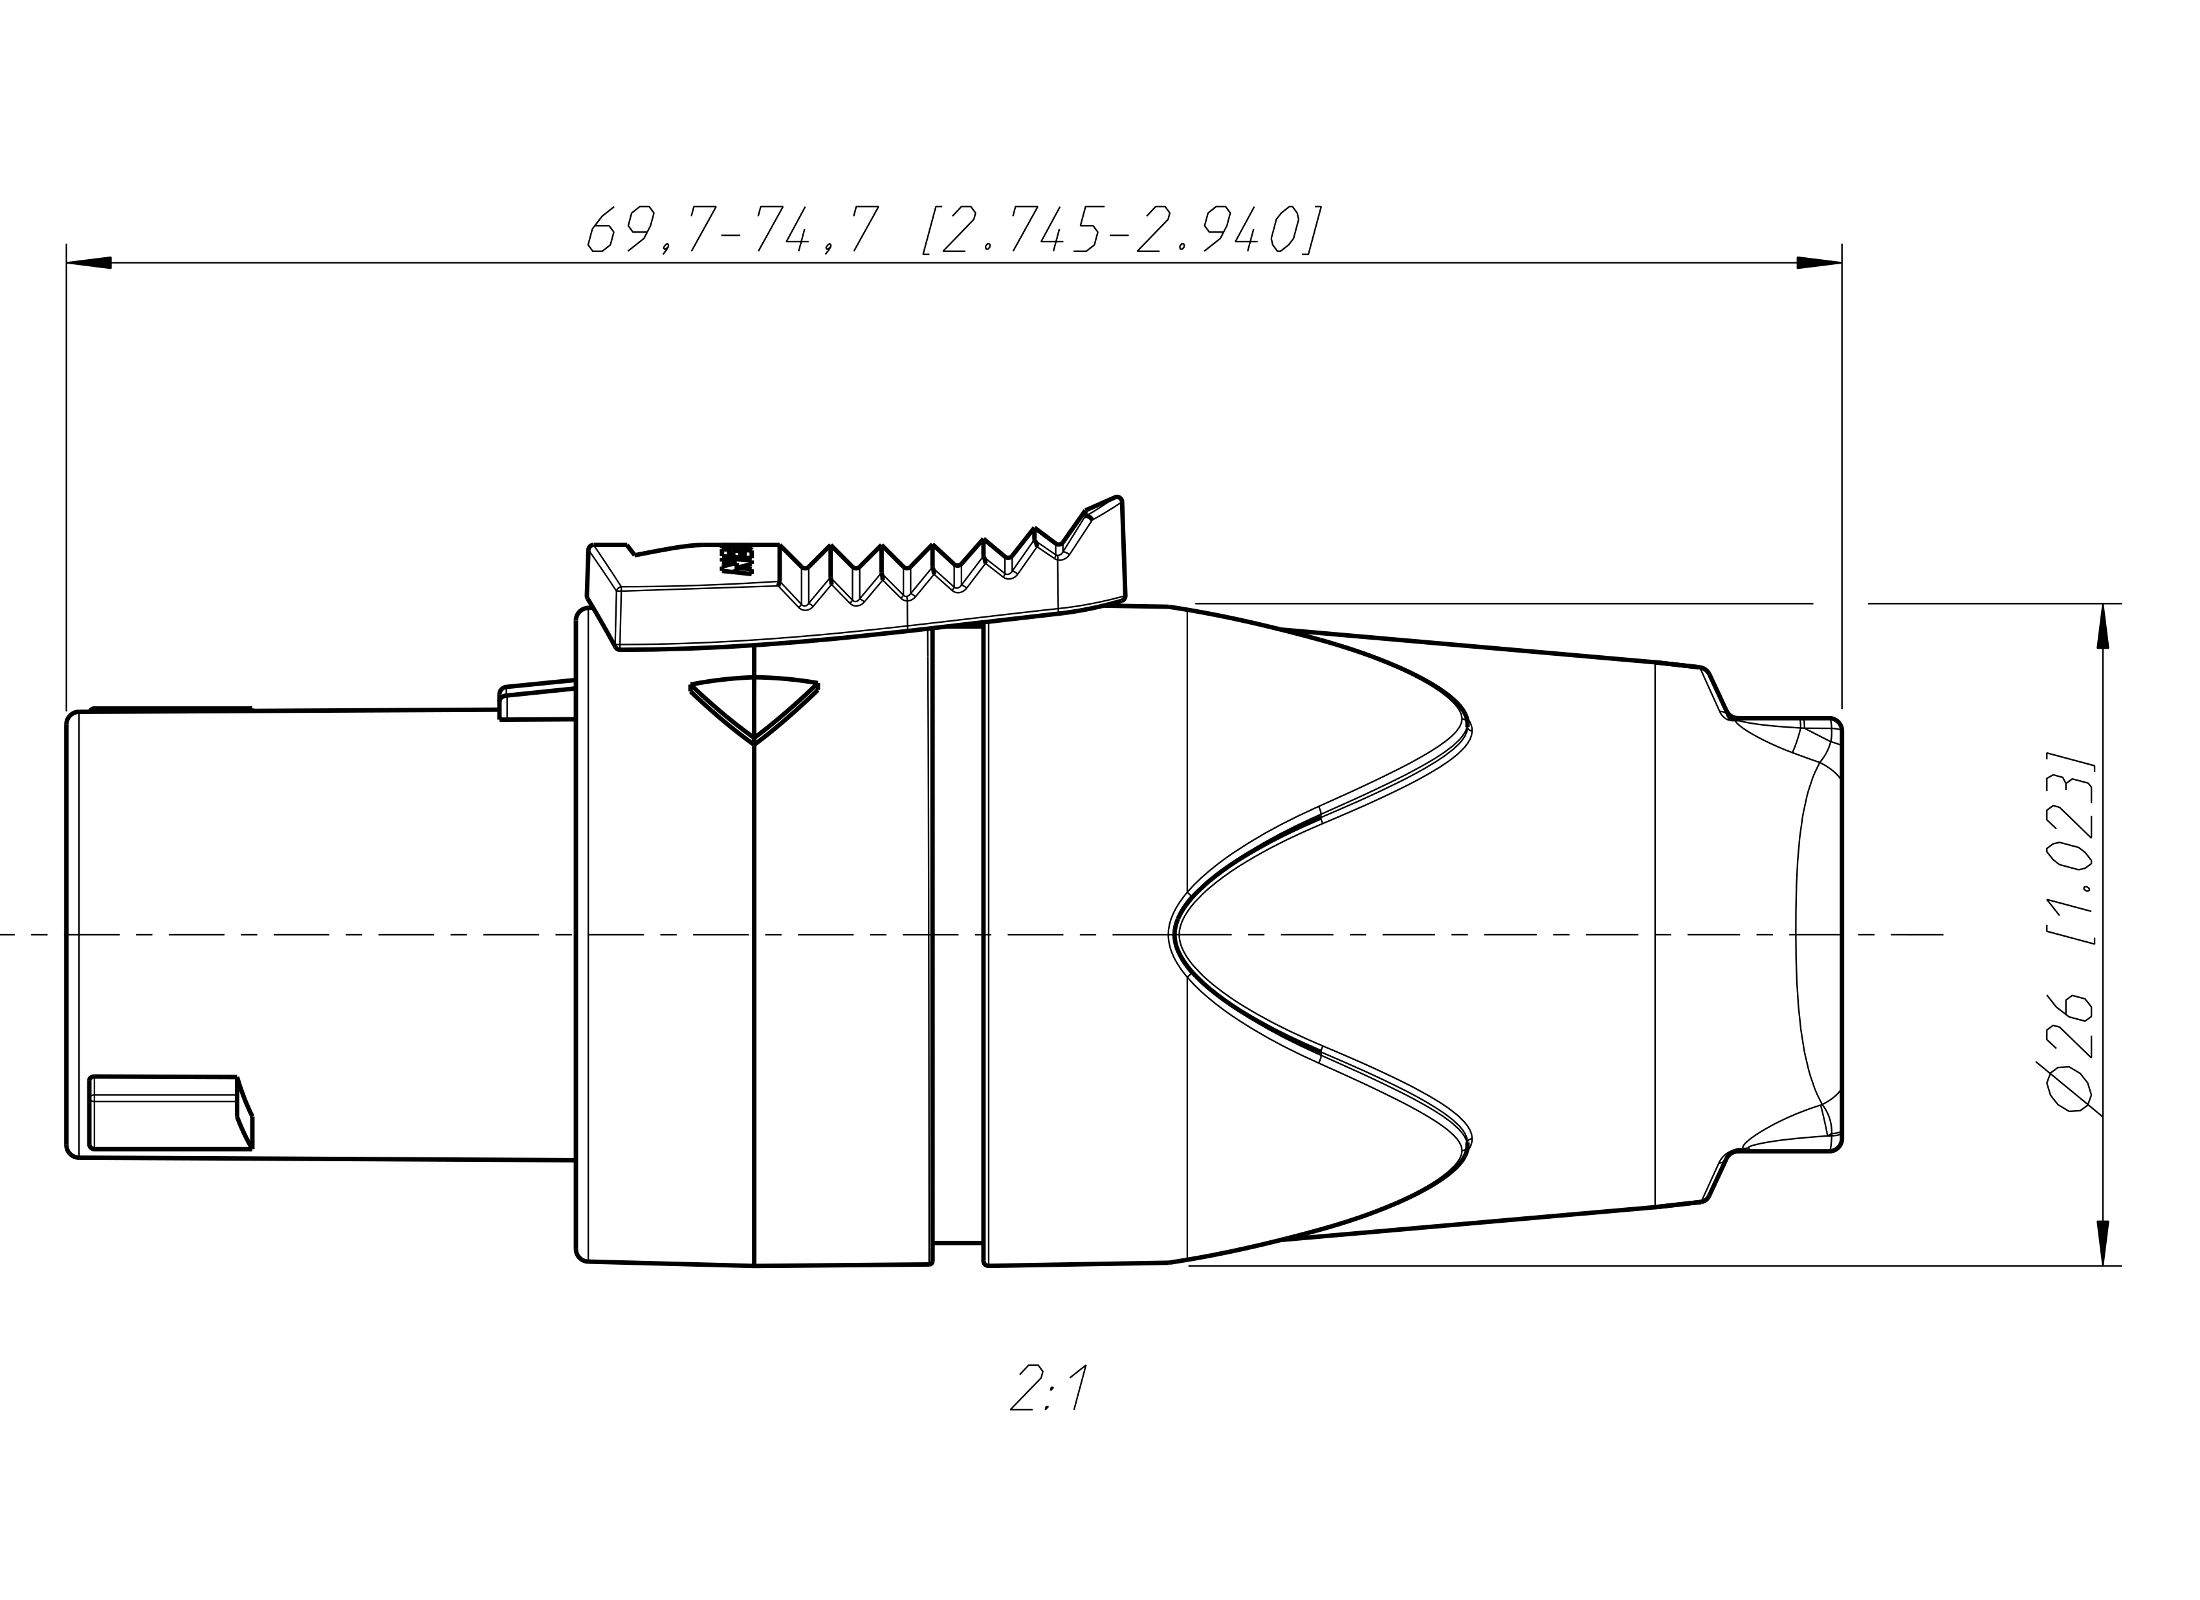 kabelquerschnitt berechnen formel verlustleistung berechnen drehstrom kfz versicherung. Black Bedroom Furniture Sets. Home Design Ideas